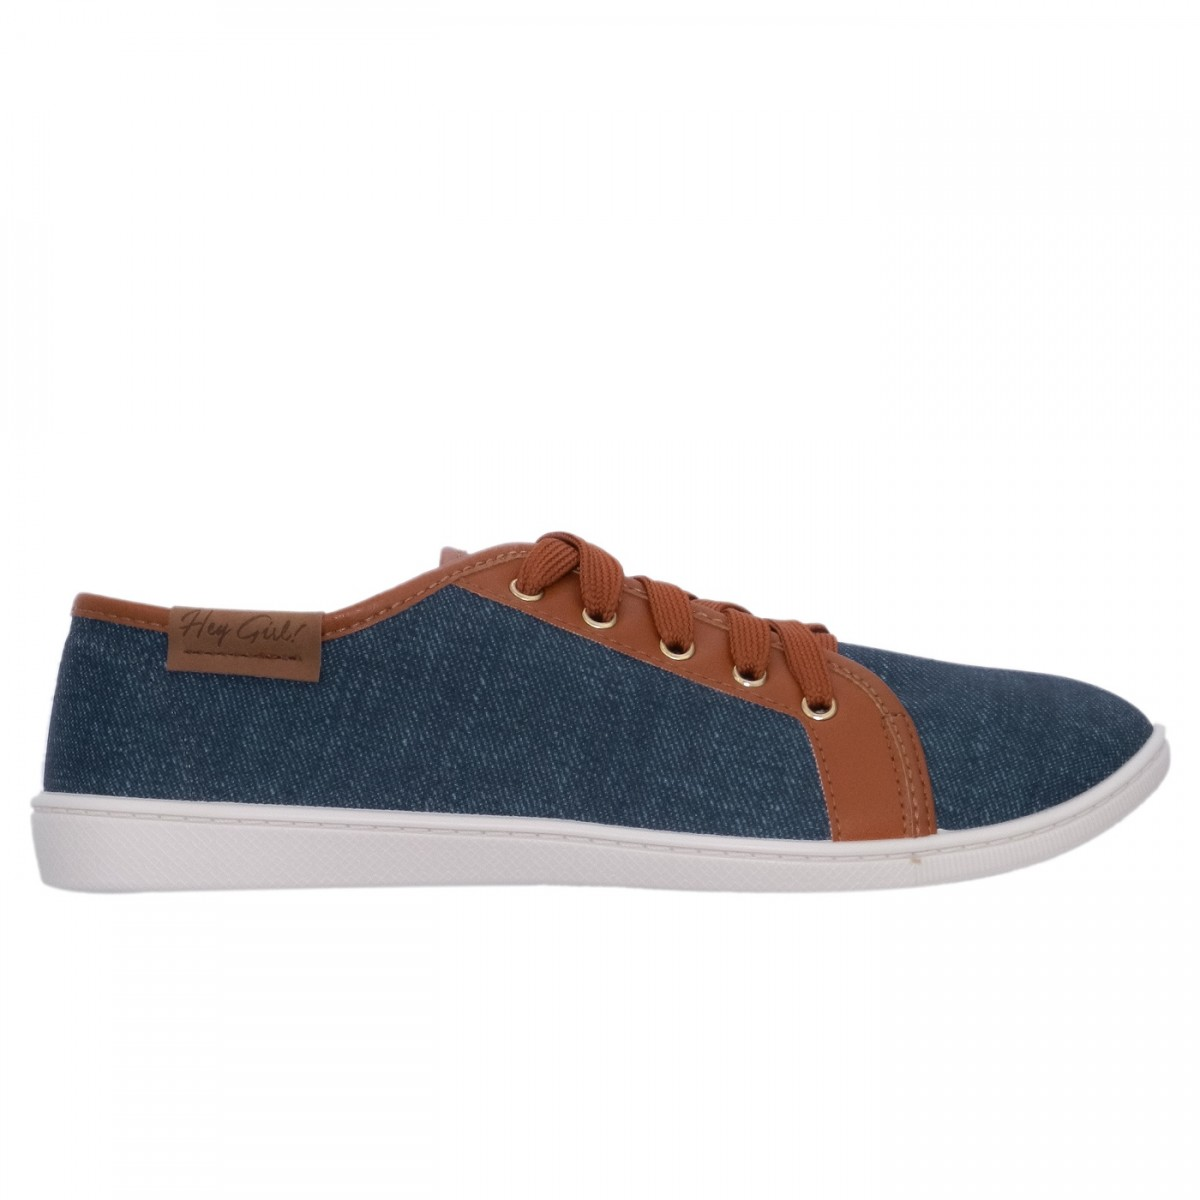 86935616487 Bizz Store - Tênis Feminino Moleca Tecido Lona Casual Jeans